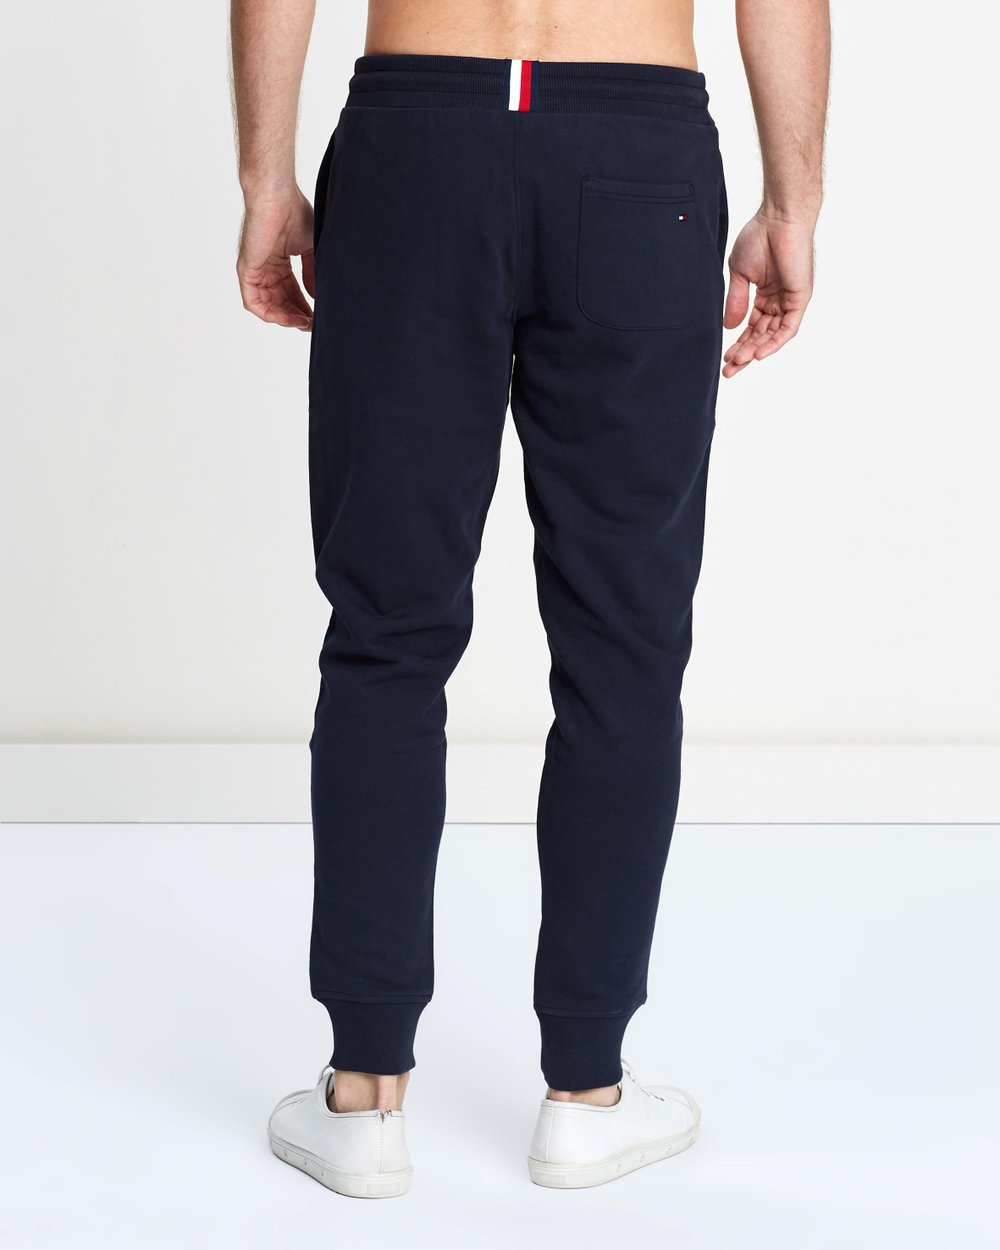 90c3d138018537 Basic Branded Sweatpants by Tommy Hilfiger Online